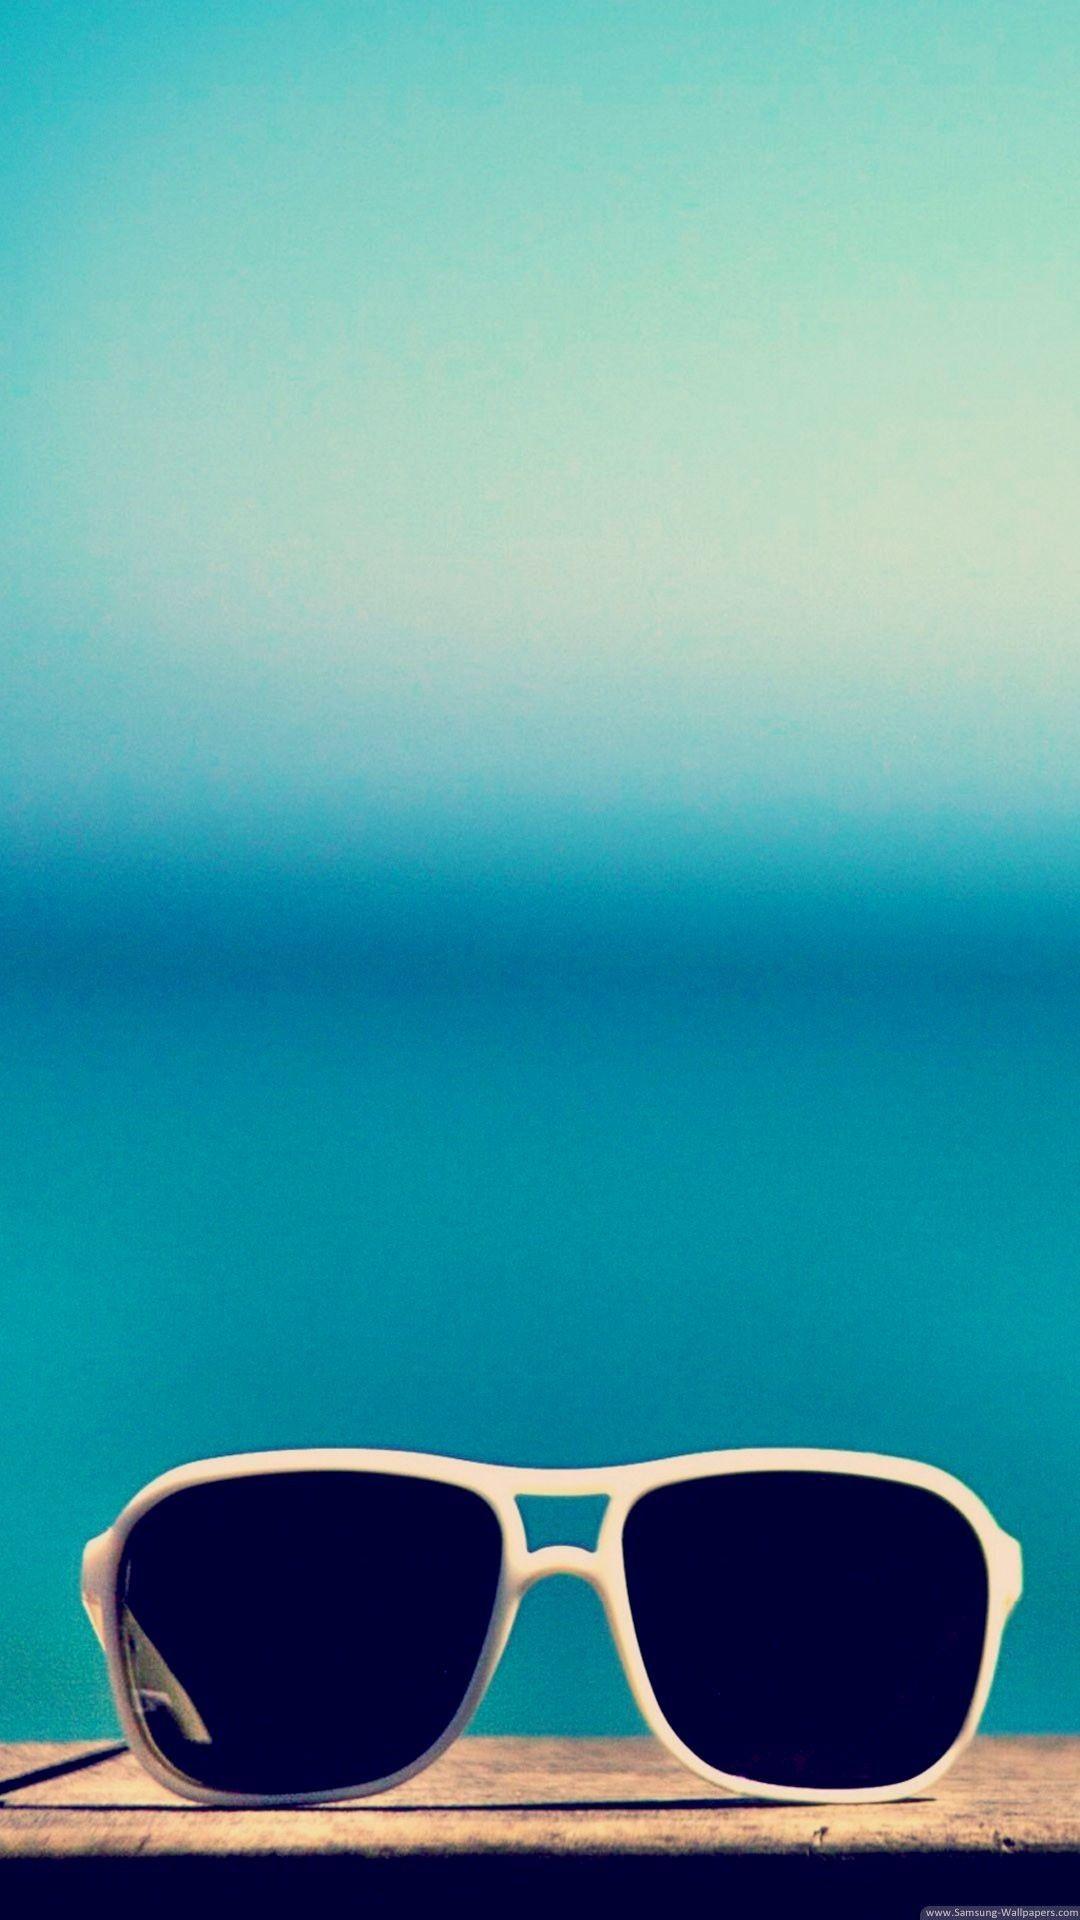 Pin By Ali Adnan On Amazing Pics Iphone Wallpaper Tumblr Iphone